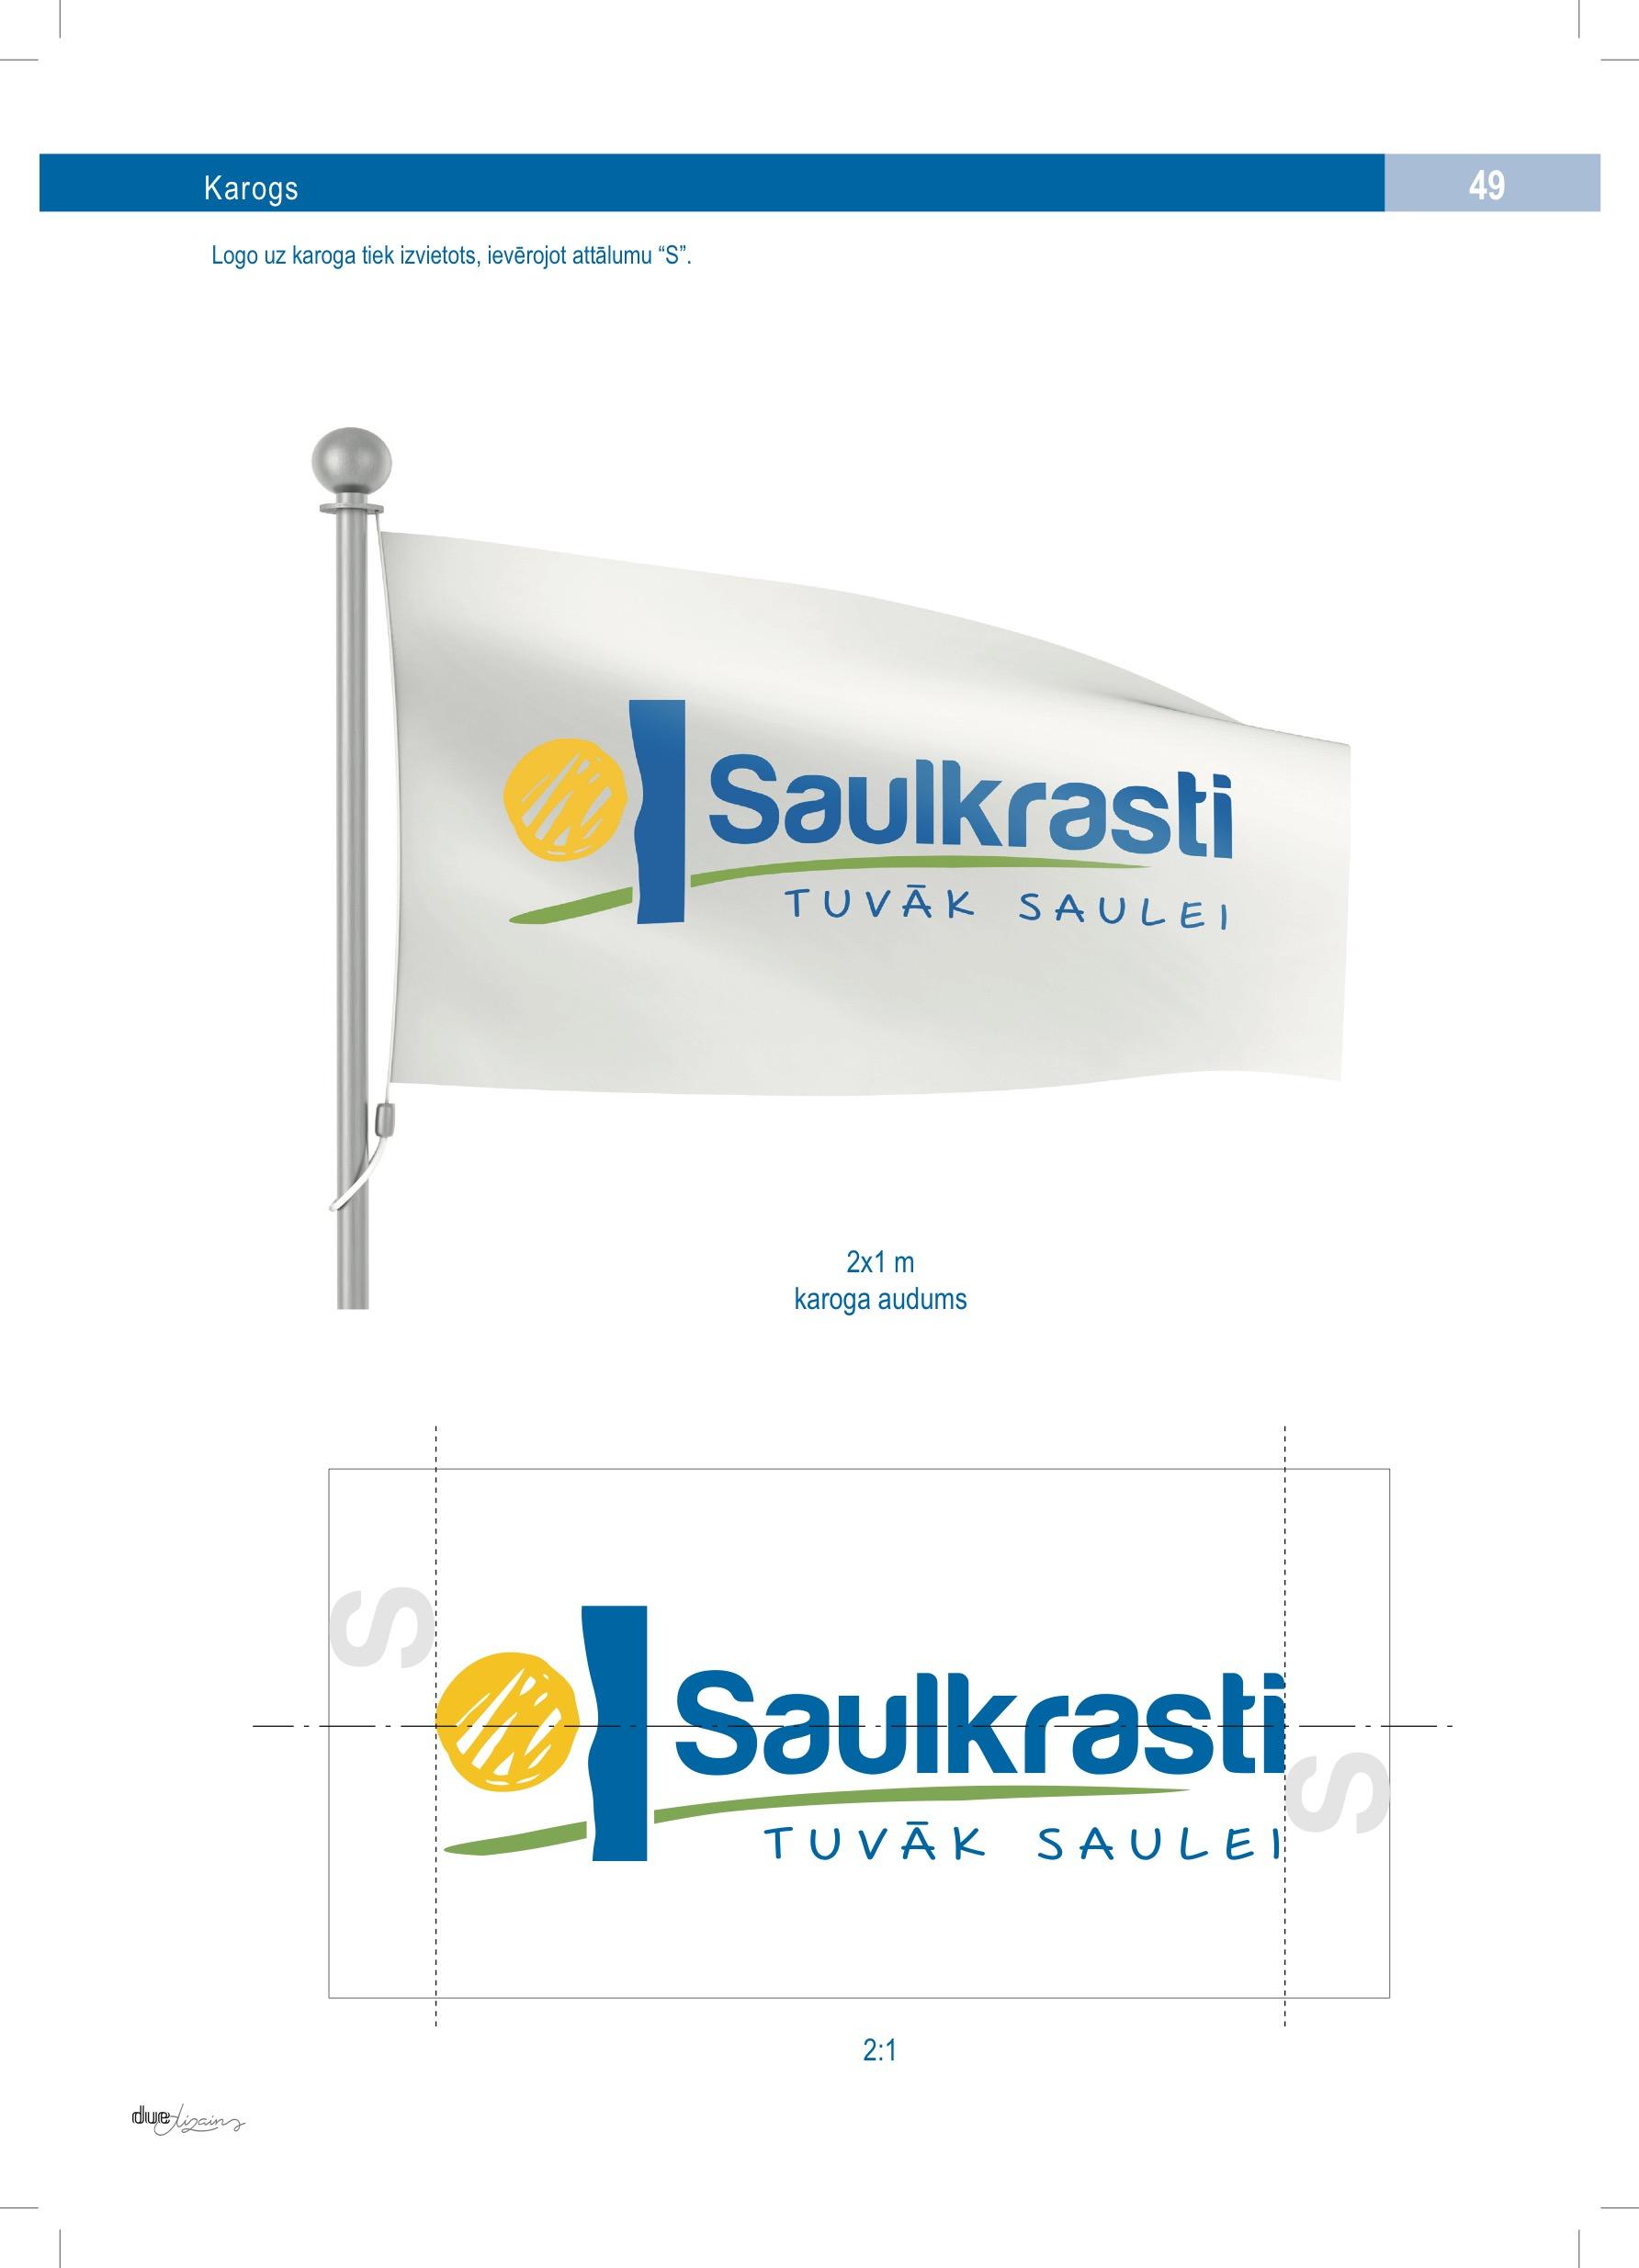 saulkrasti-print 51